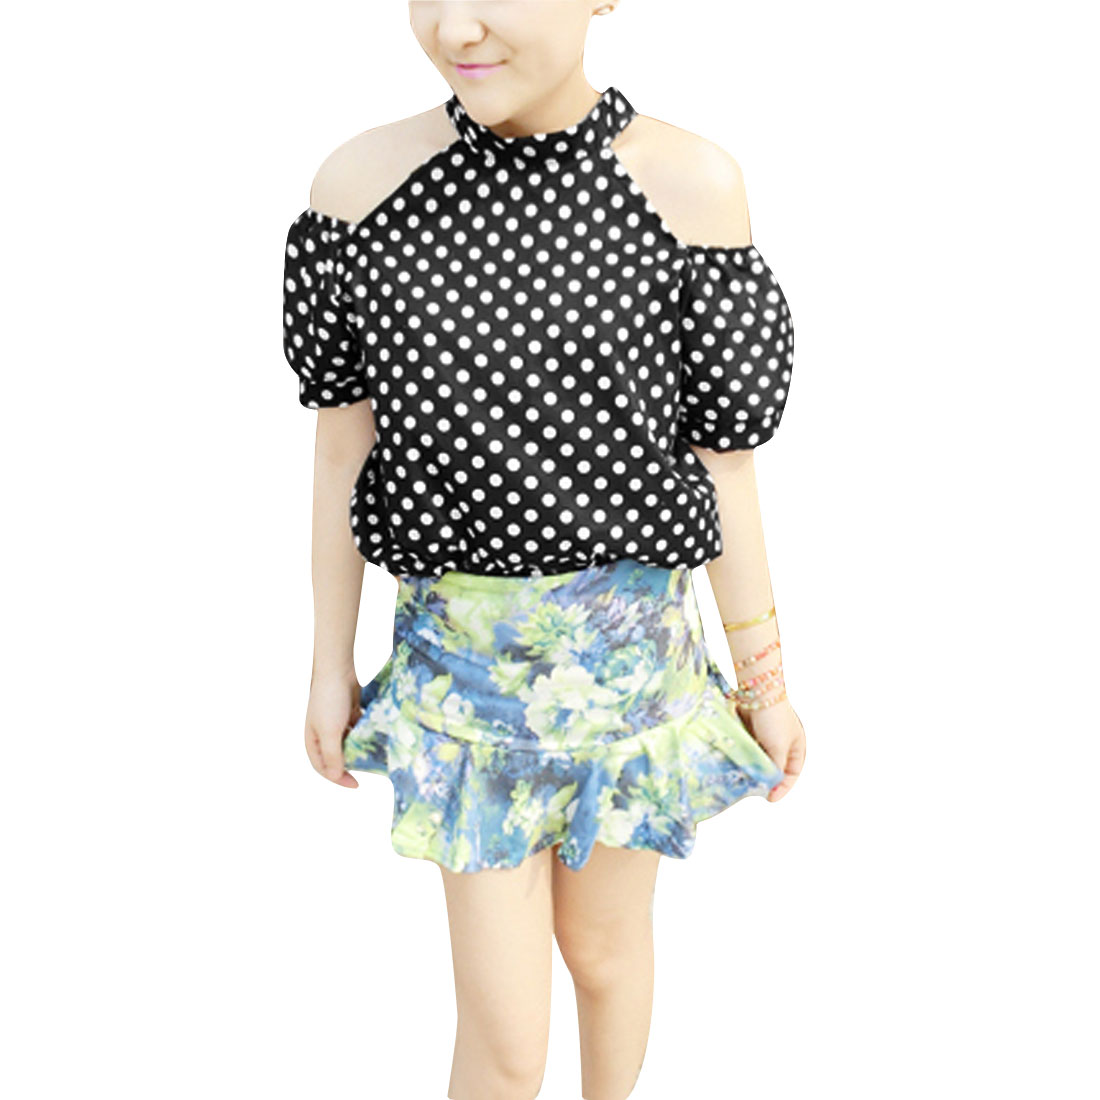 Woman Chic Cutout Shoulder Short Puff Sleeve Design Black Casual Blouse S